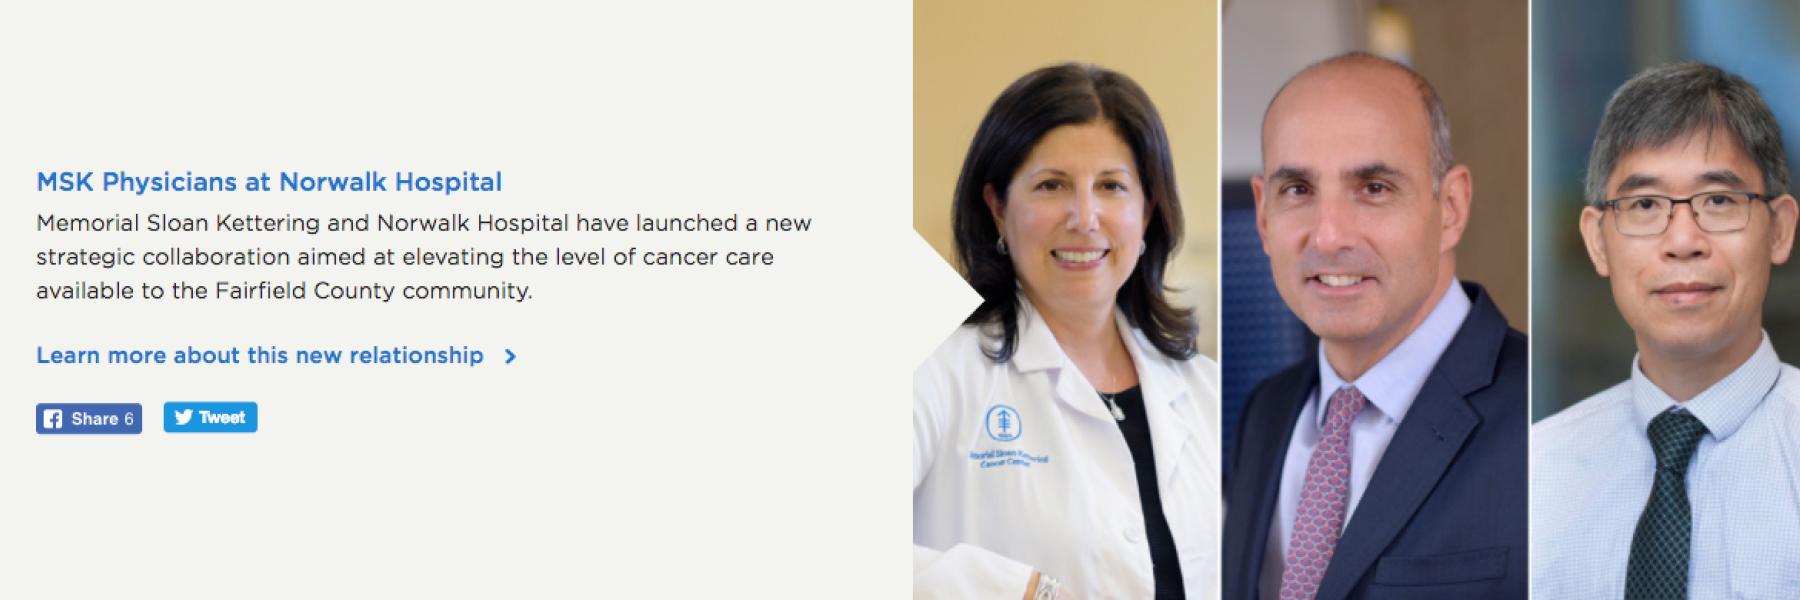 Memorial Sloan Kettering Cancer Center - First Enterprise